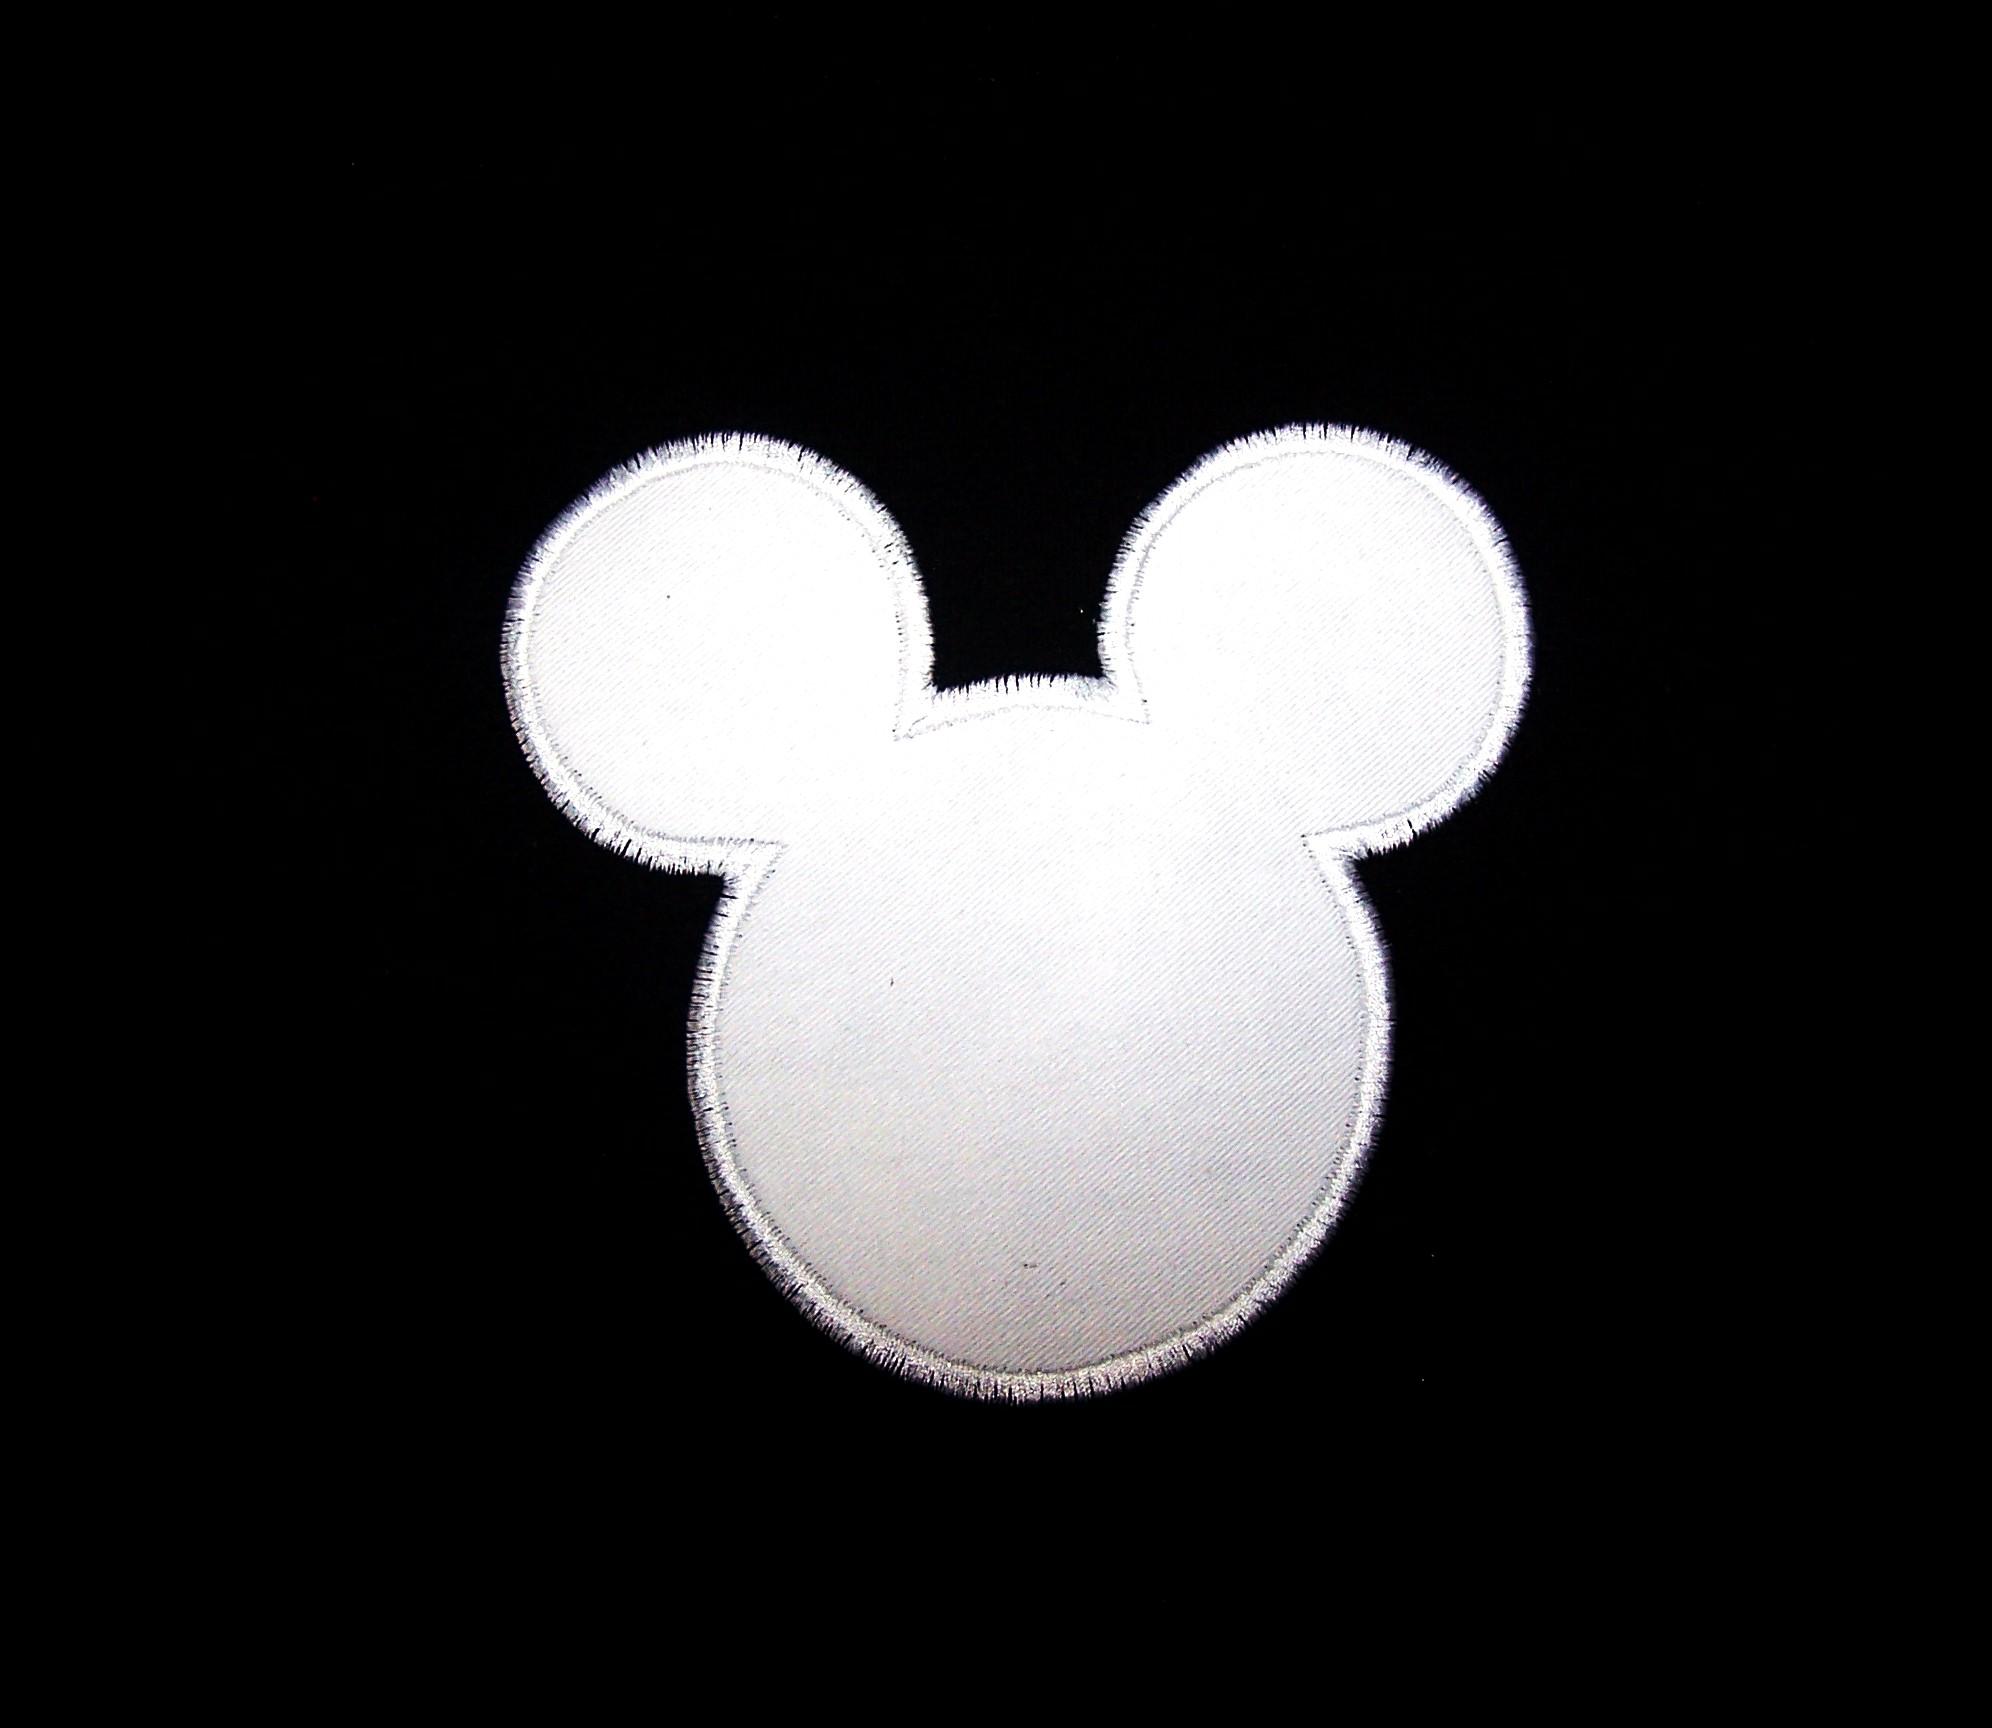 mickey mouse ears - HD1992×1728